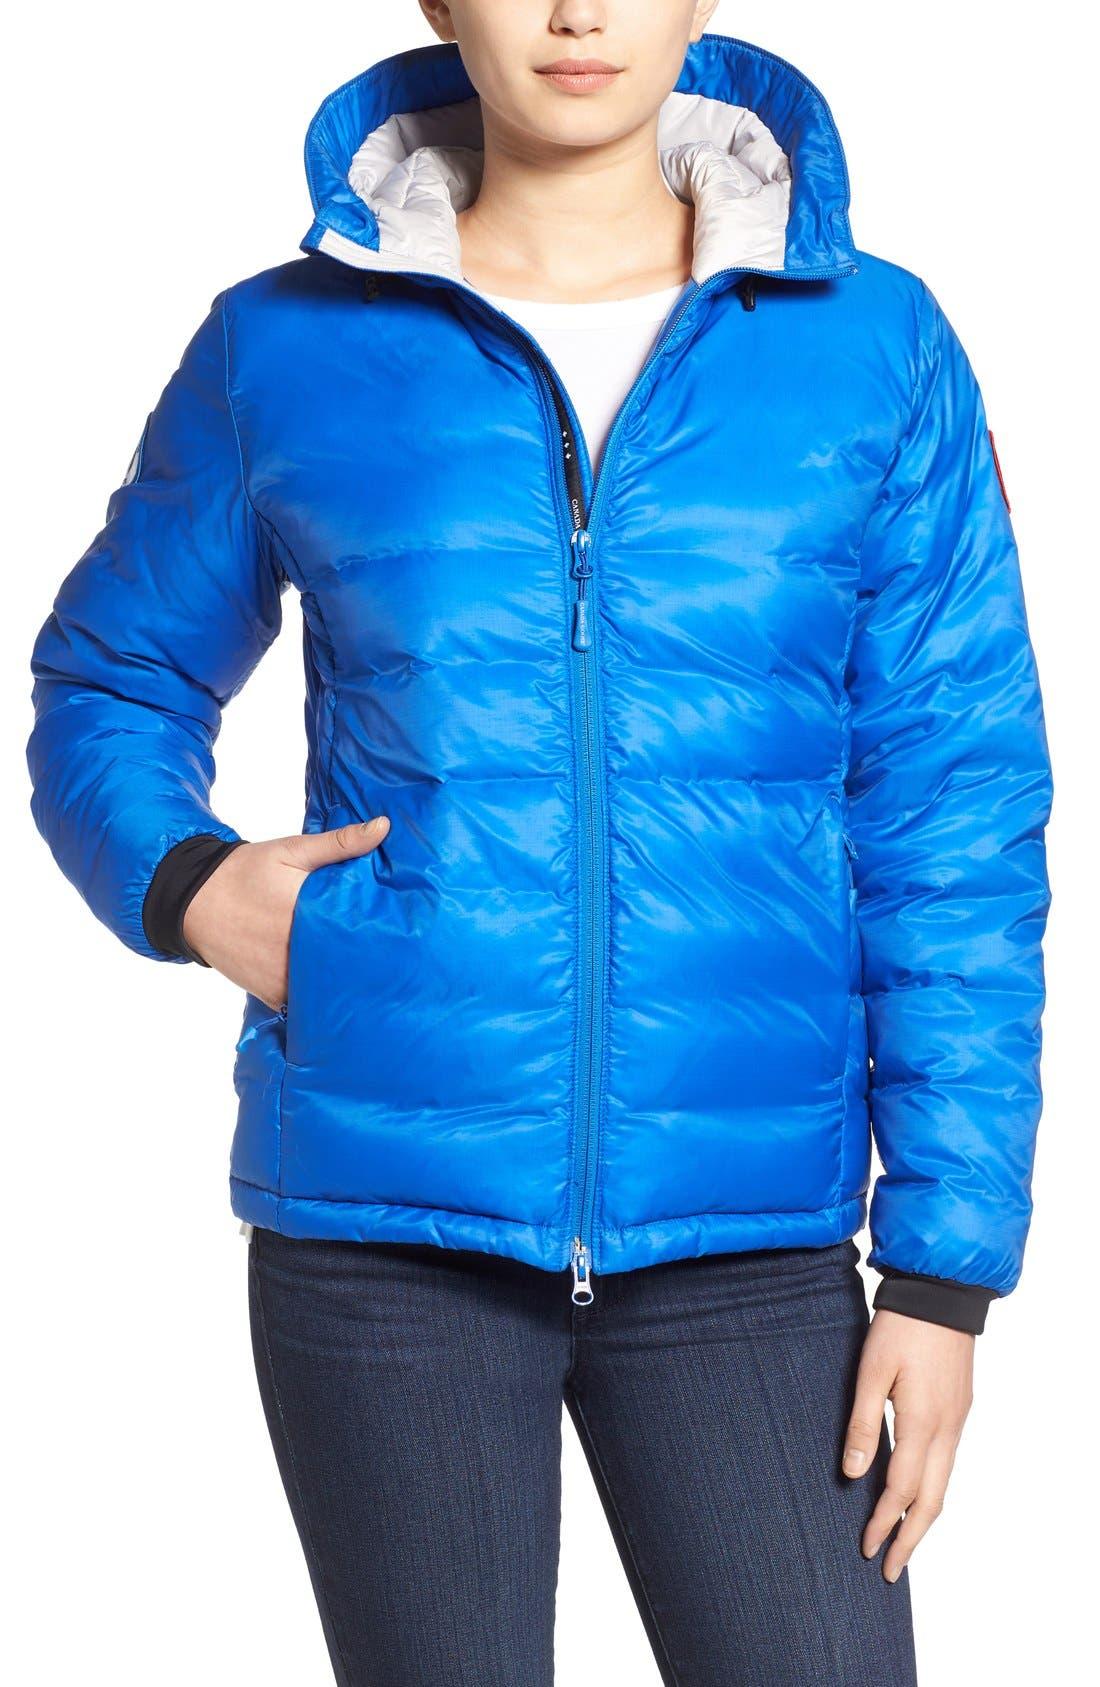 'PBI Camp' Packable Hooded Down Jacket,                         Main,                         color, ROYAL PBI BLUE